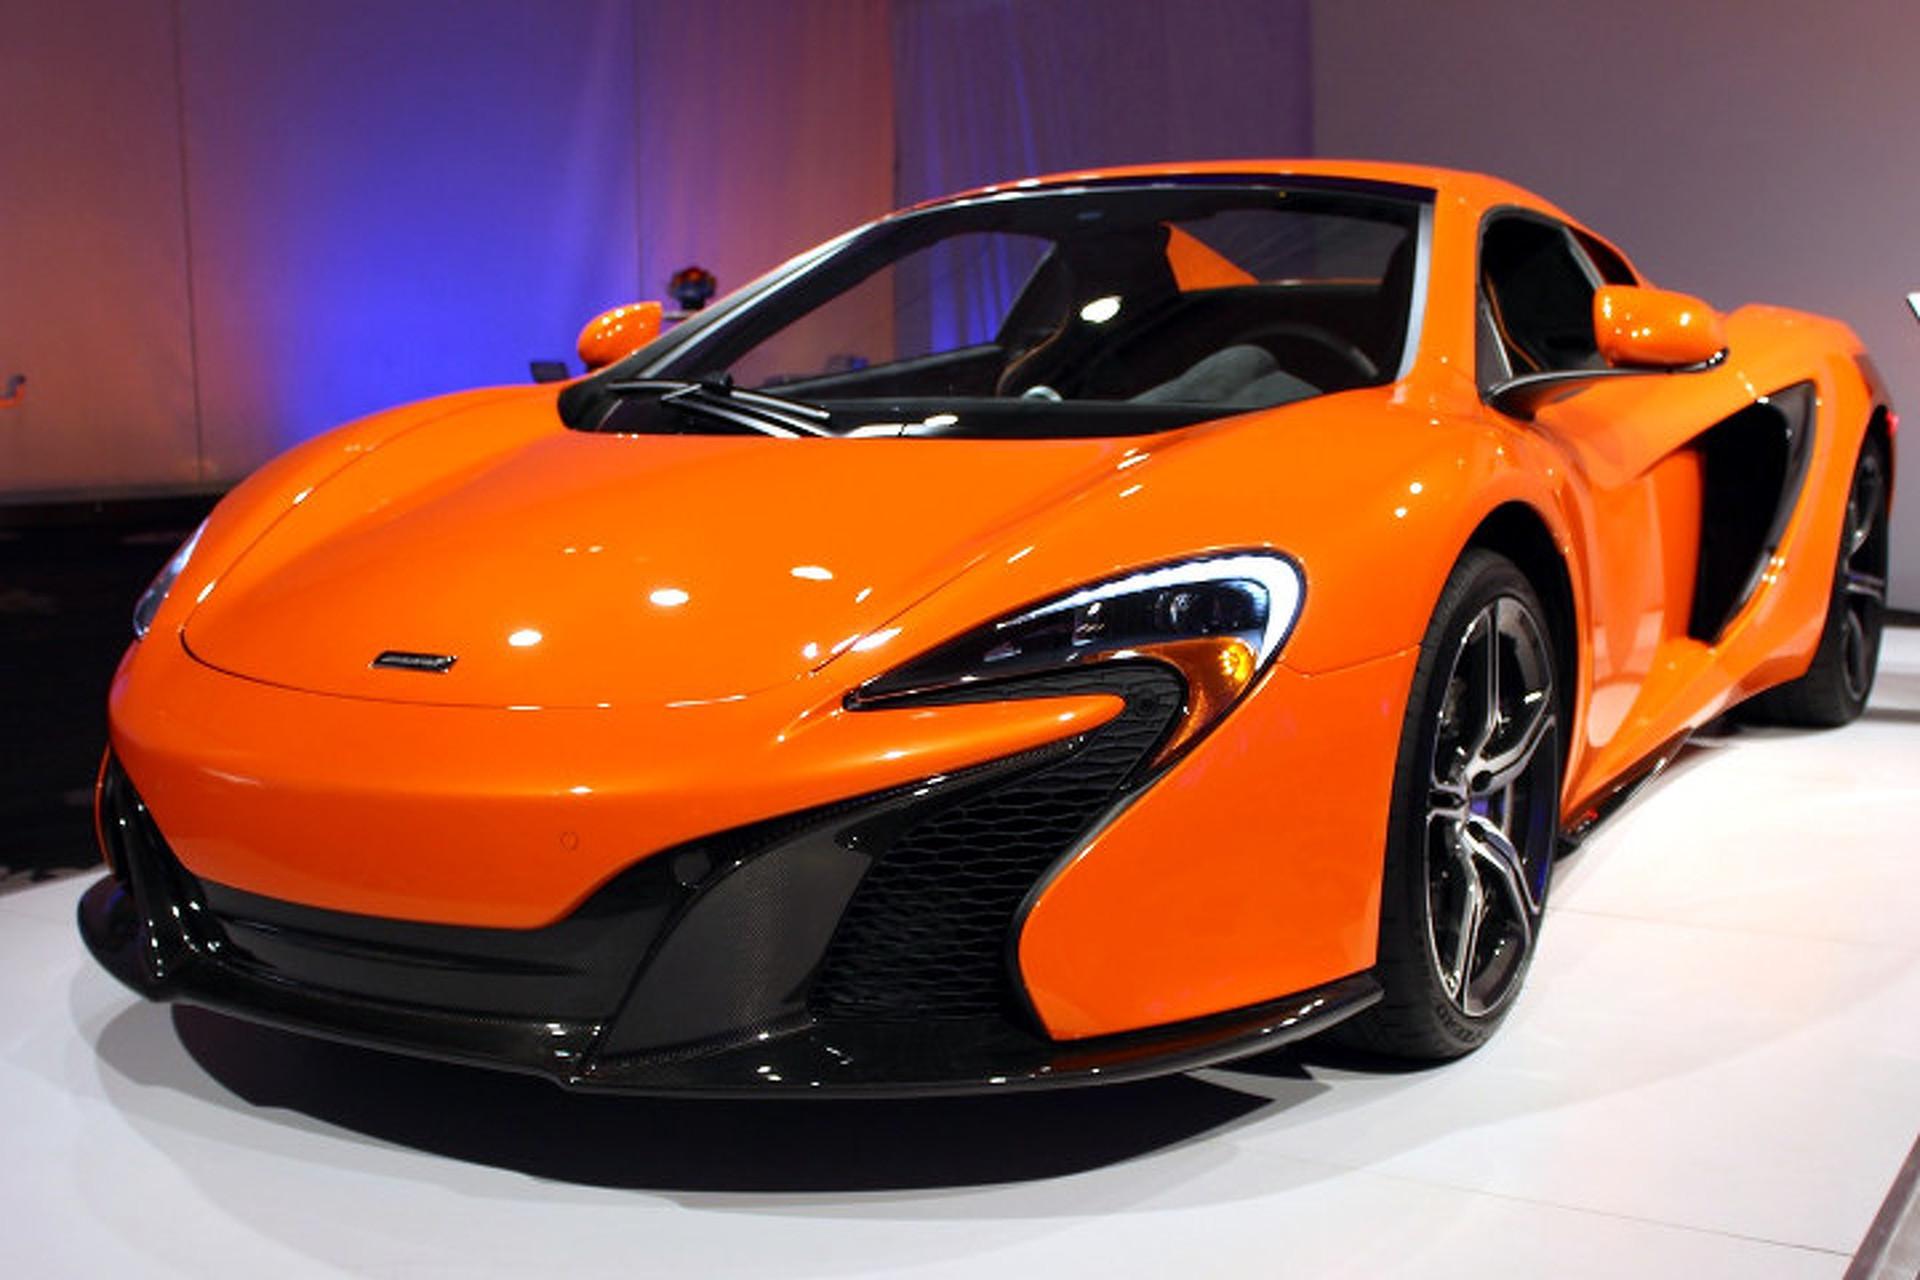 2015 McLaren 650S Spider is Even Prettier In Person